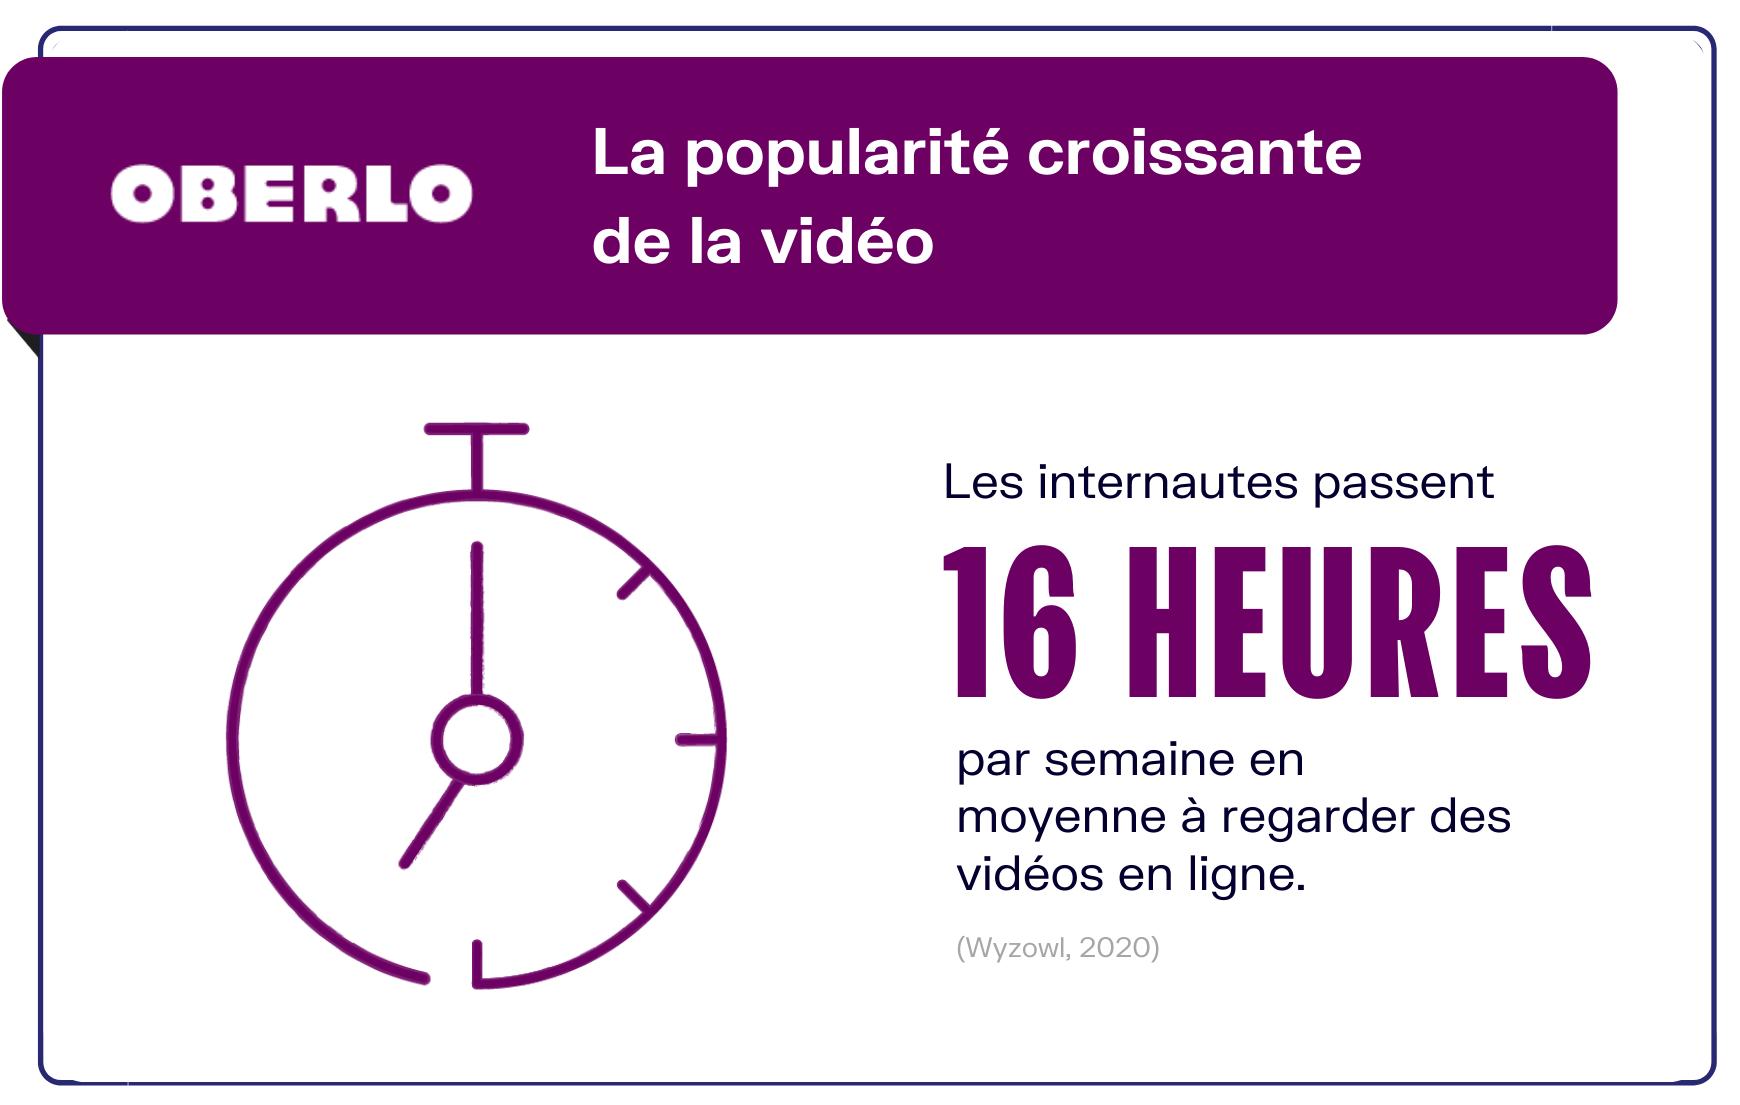 temps moyen passé regarder vidéos